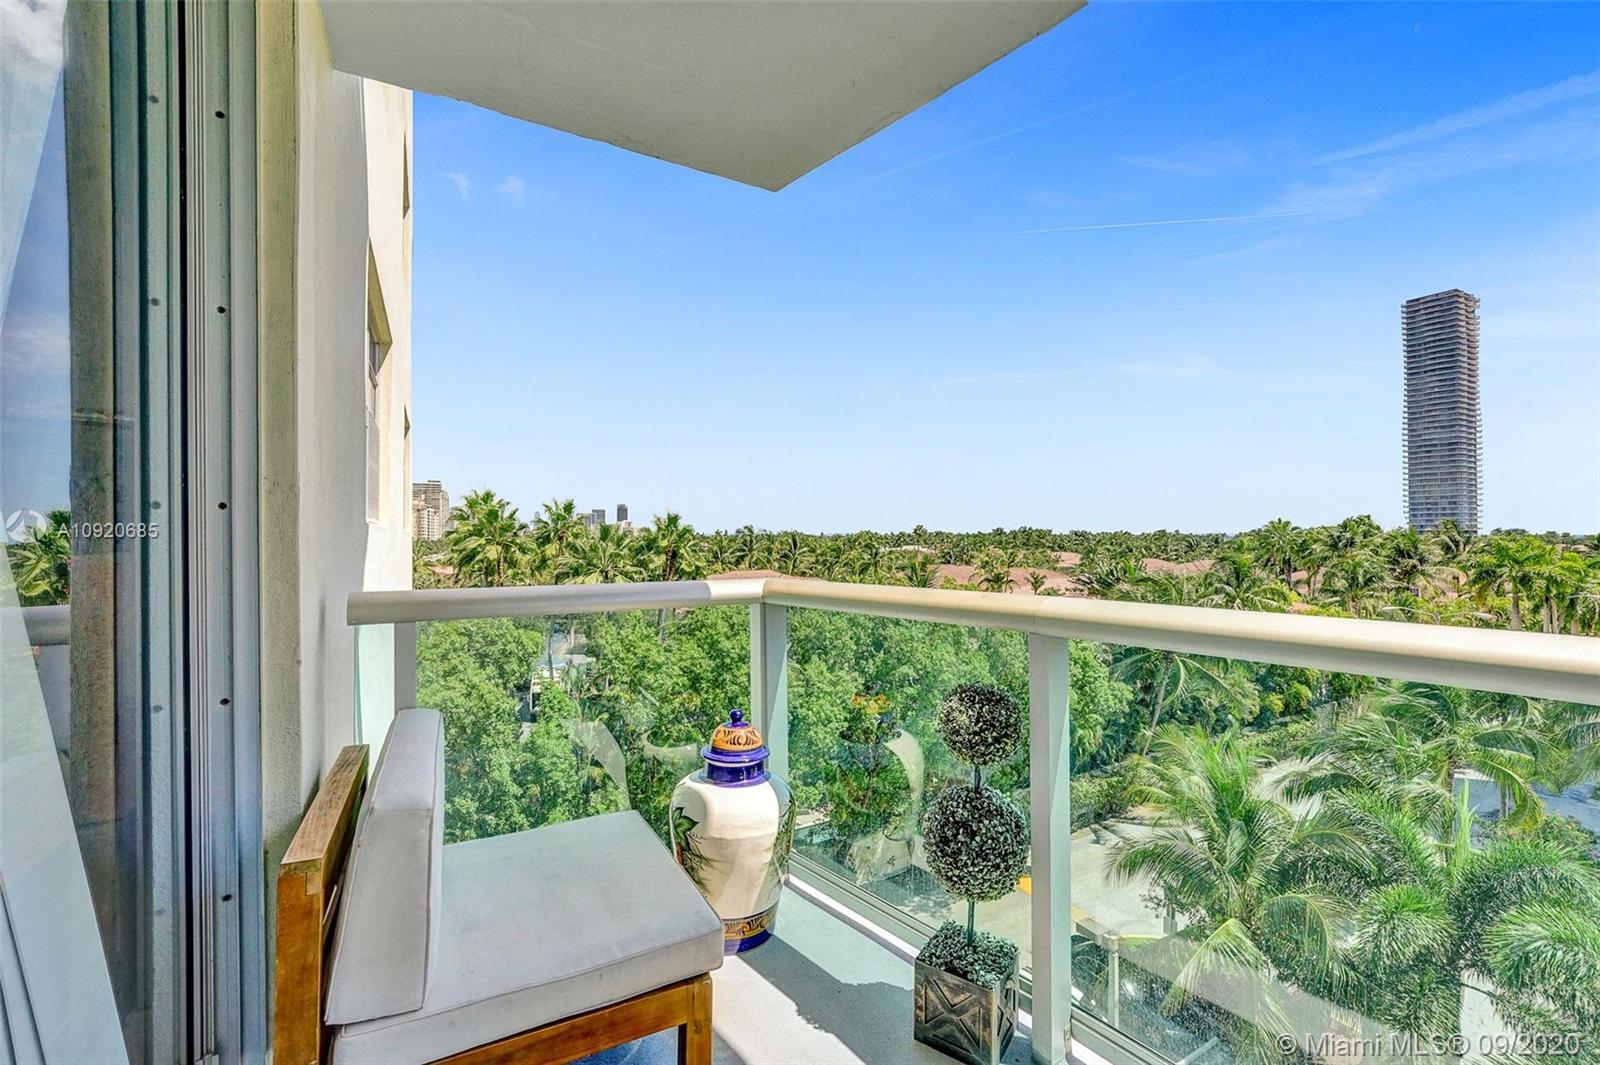 Ocean View A #526 - 19390 Collins Ave #526, Sunny Isles Beach, FL 33160